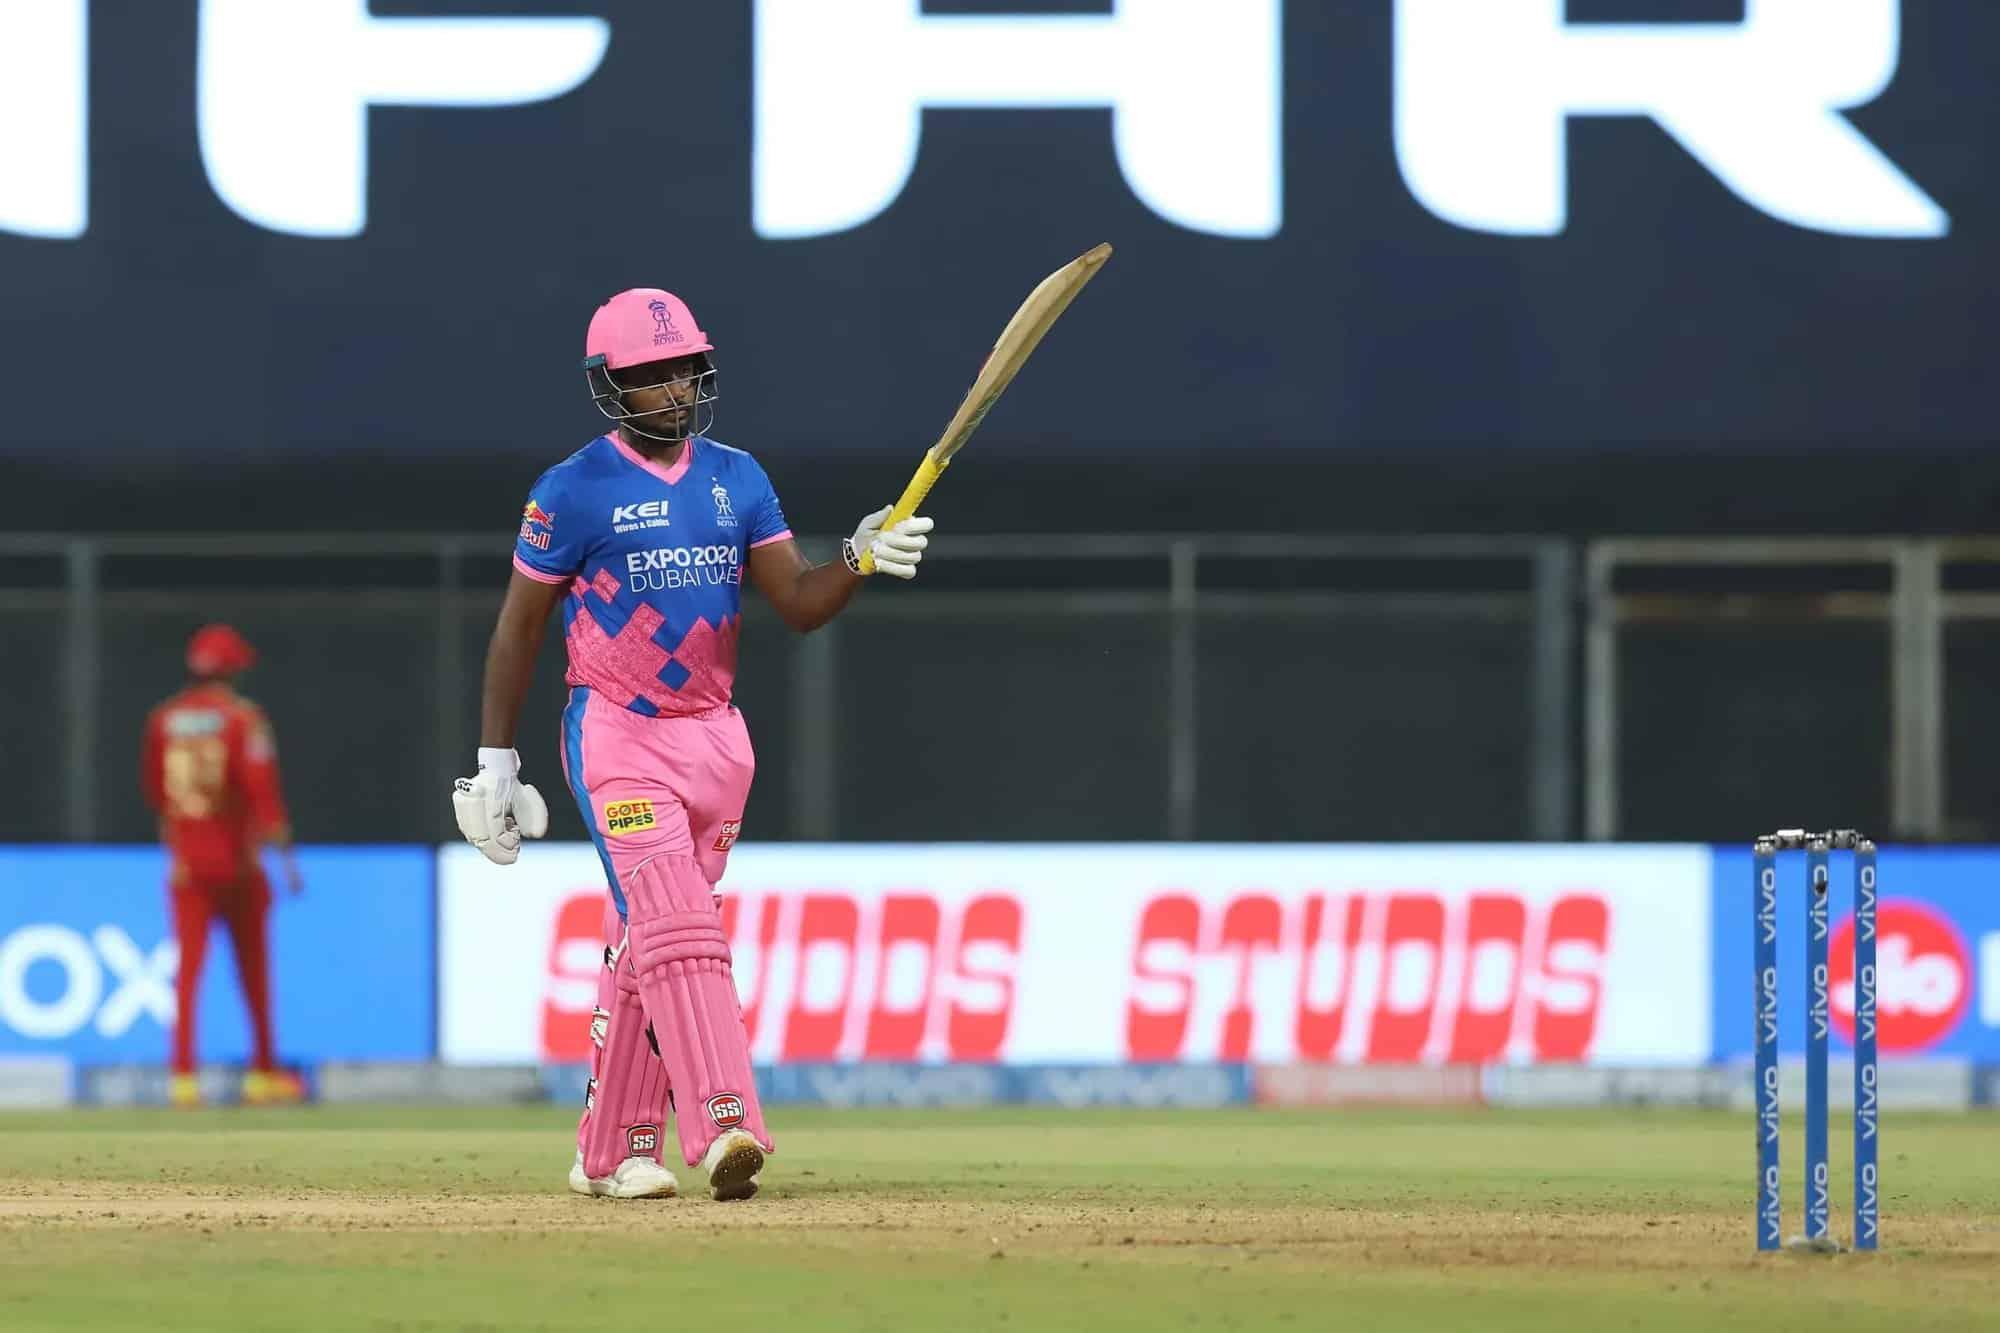 IPL 2021, Match 4 - RR vs PBKS: Sanju Samson Hundred on Debut